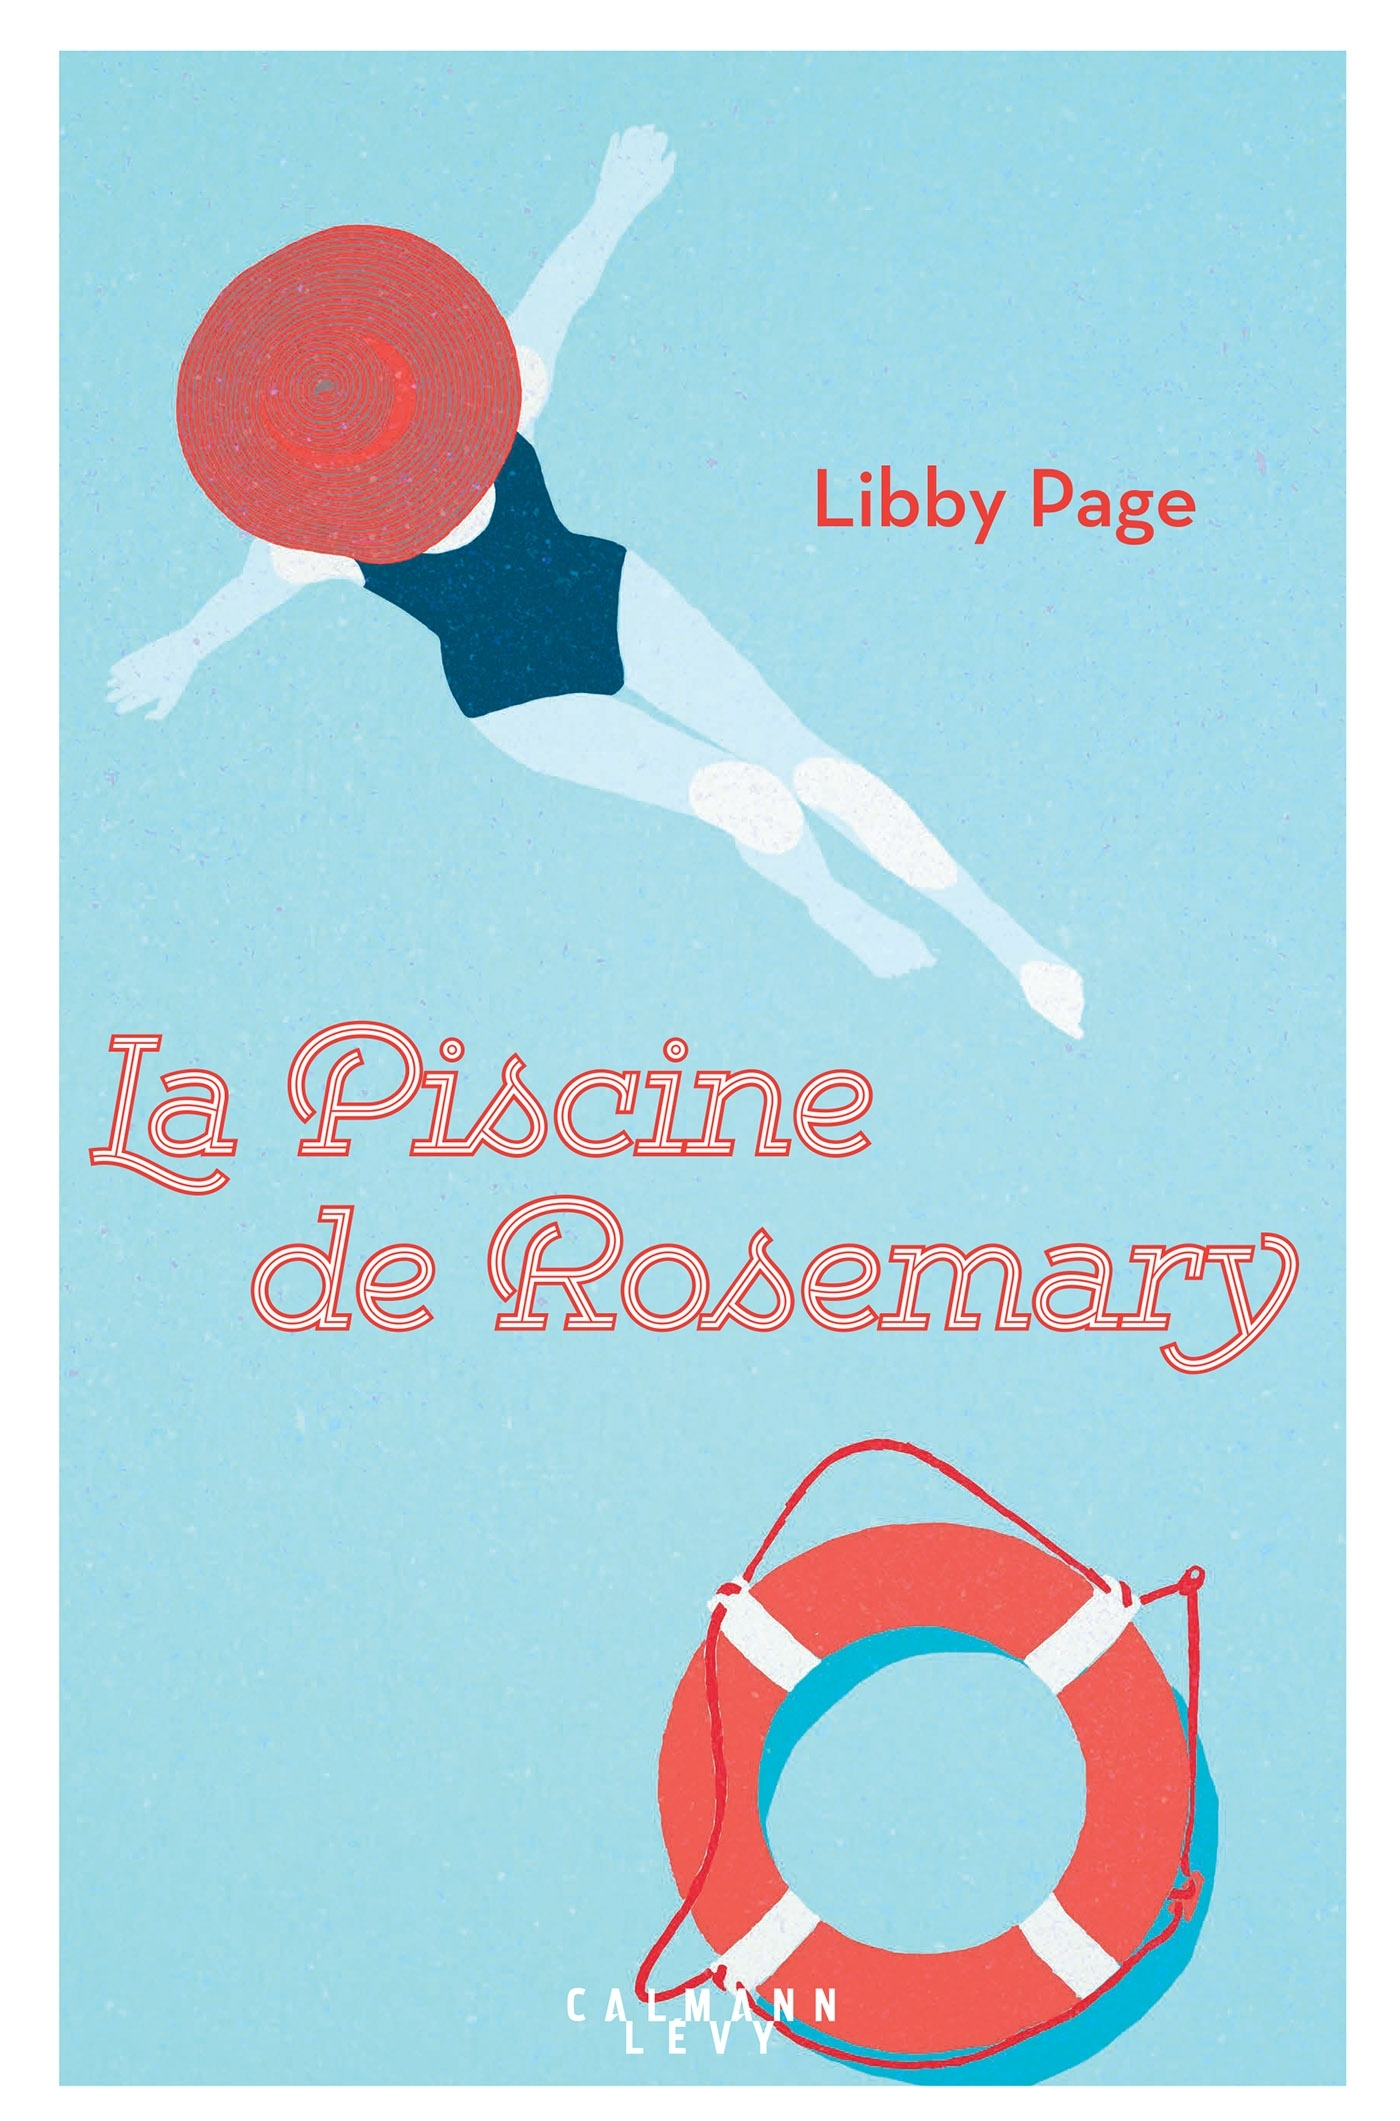 LA PISCINE DE ROSEMARY